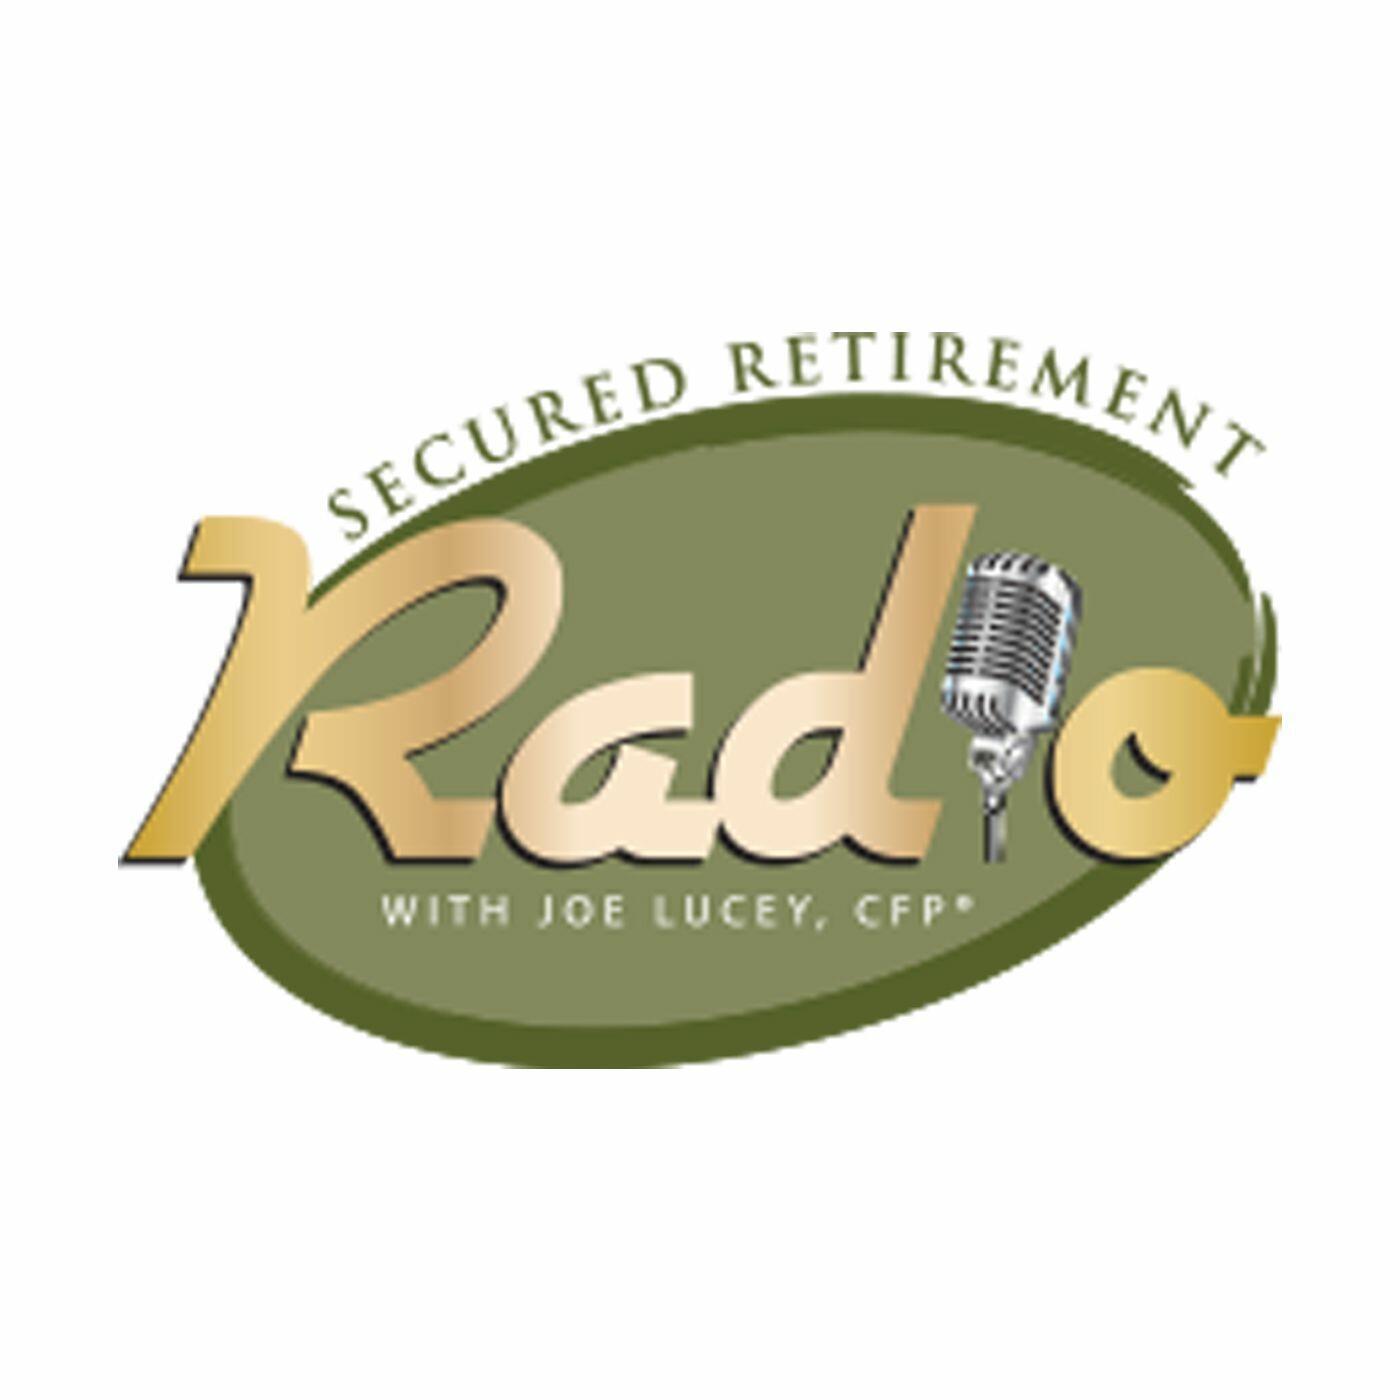 Secured Retirement Radio